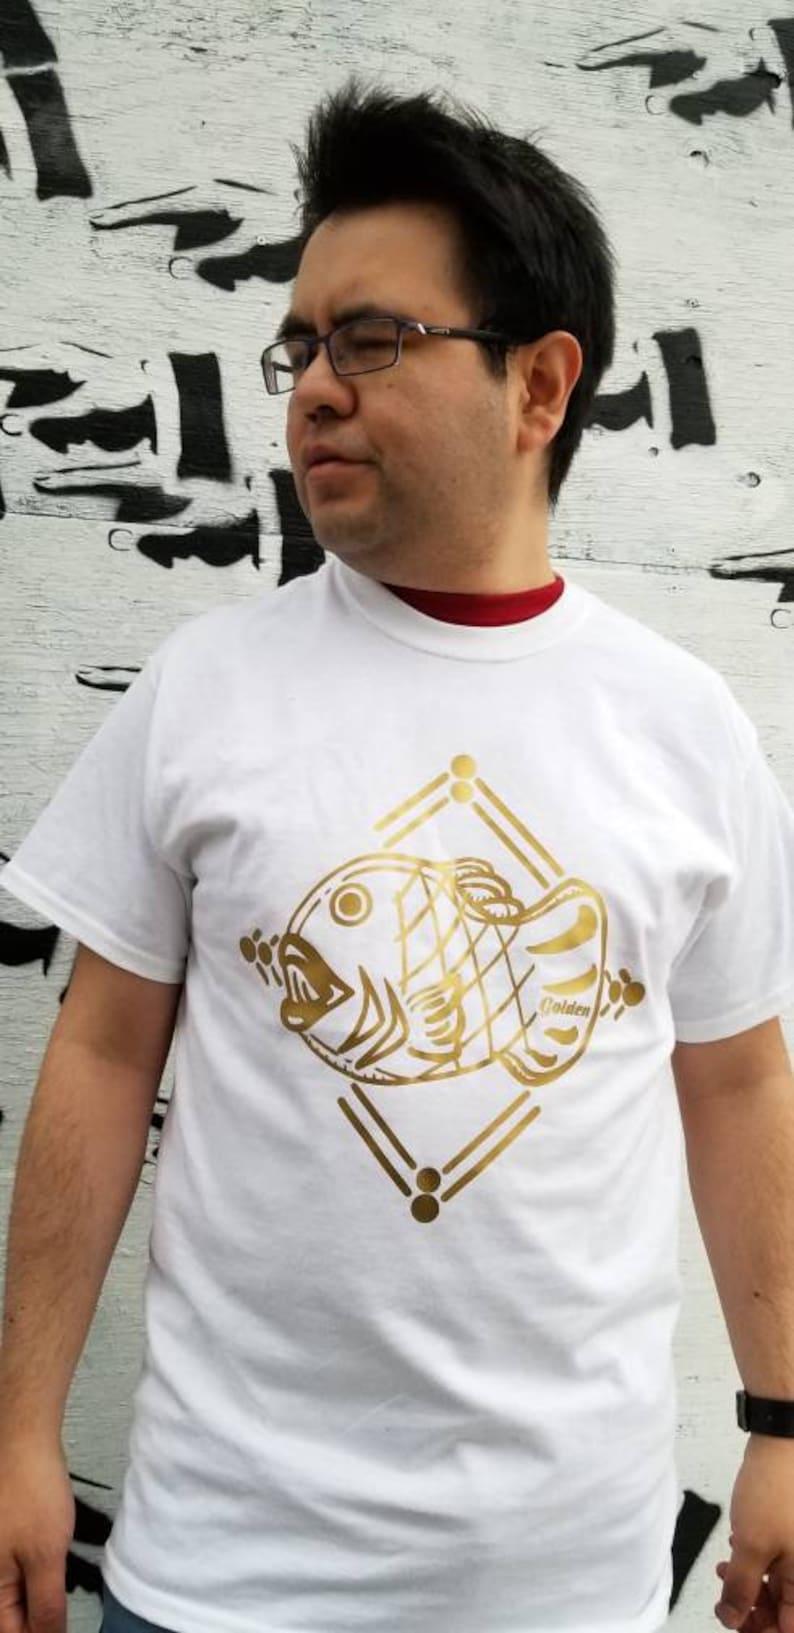 Taiyaki Golden Graphic Anime Tshirt image 0